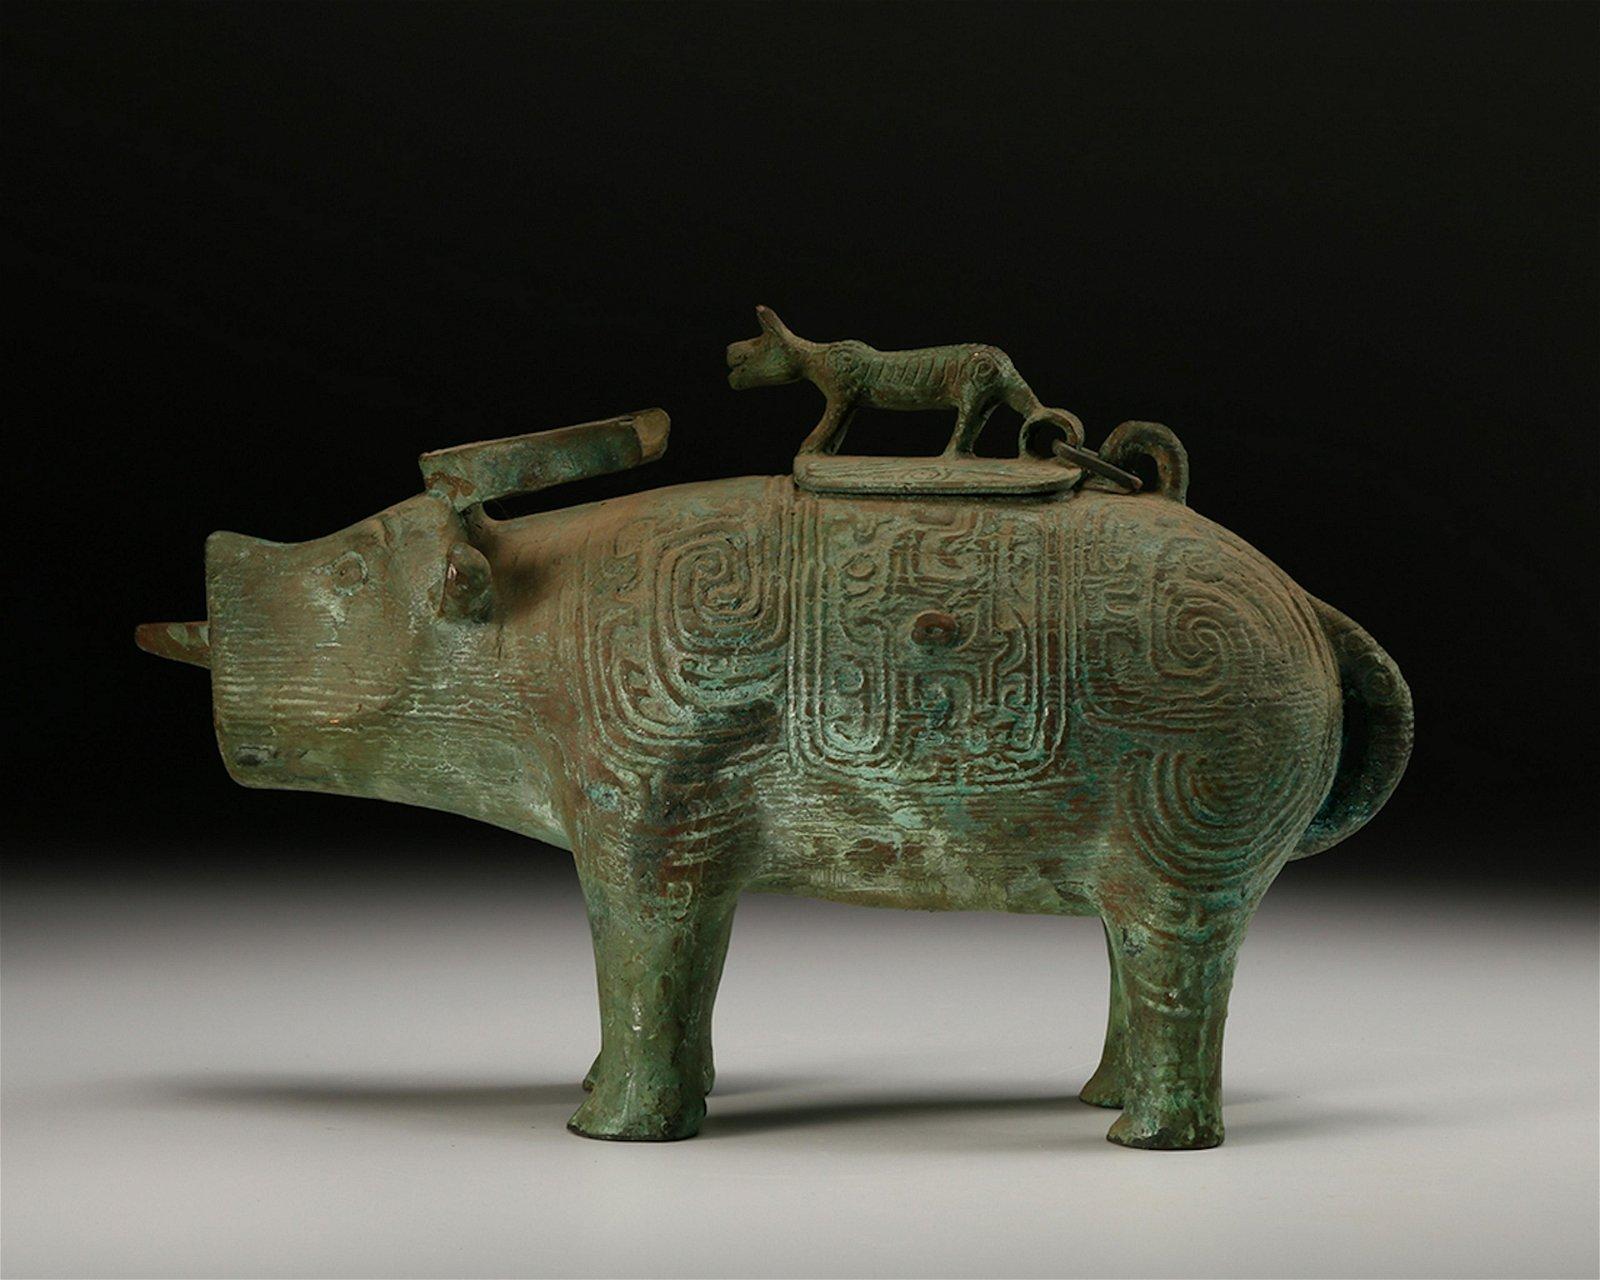 CHINESE ARCHAIC BRONZE BOAR CENSER VESSEL